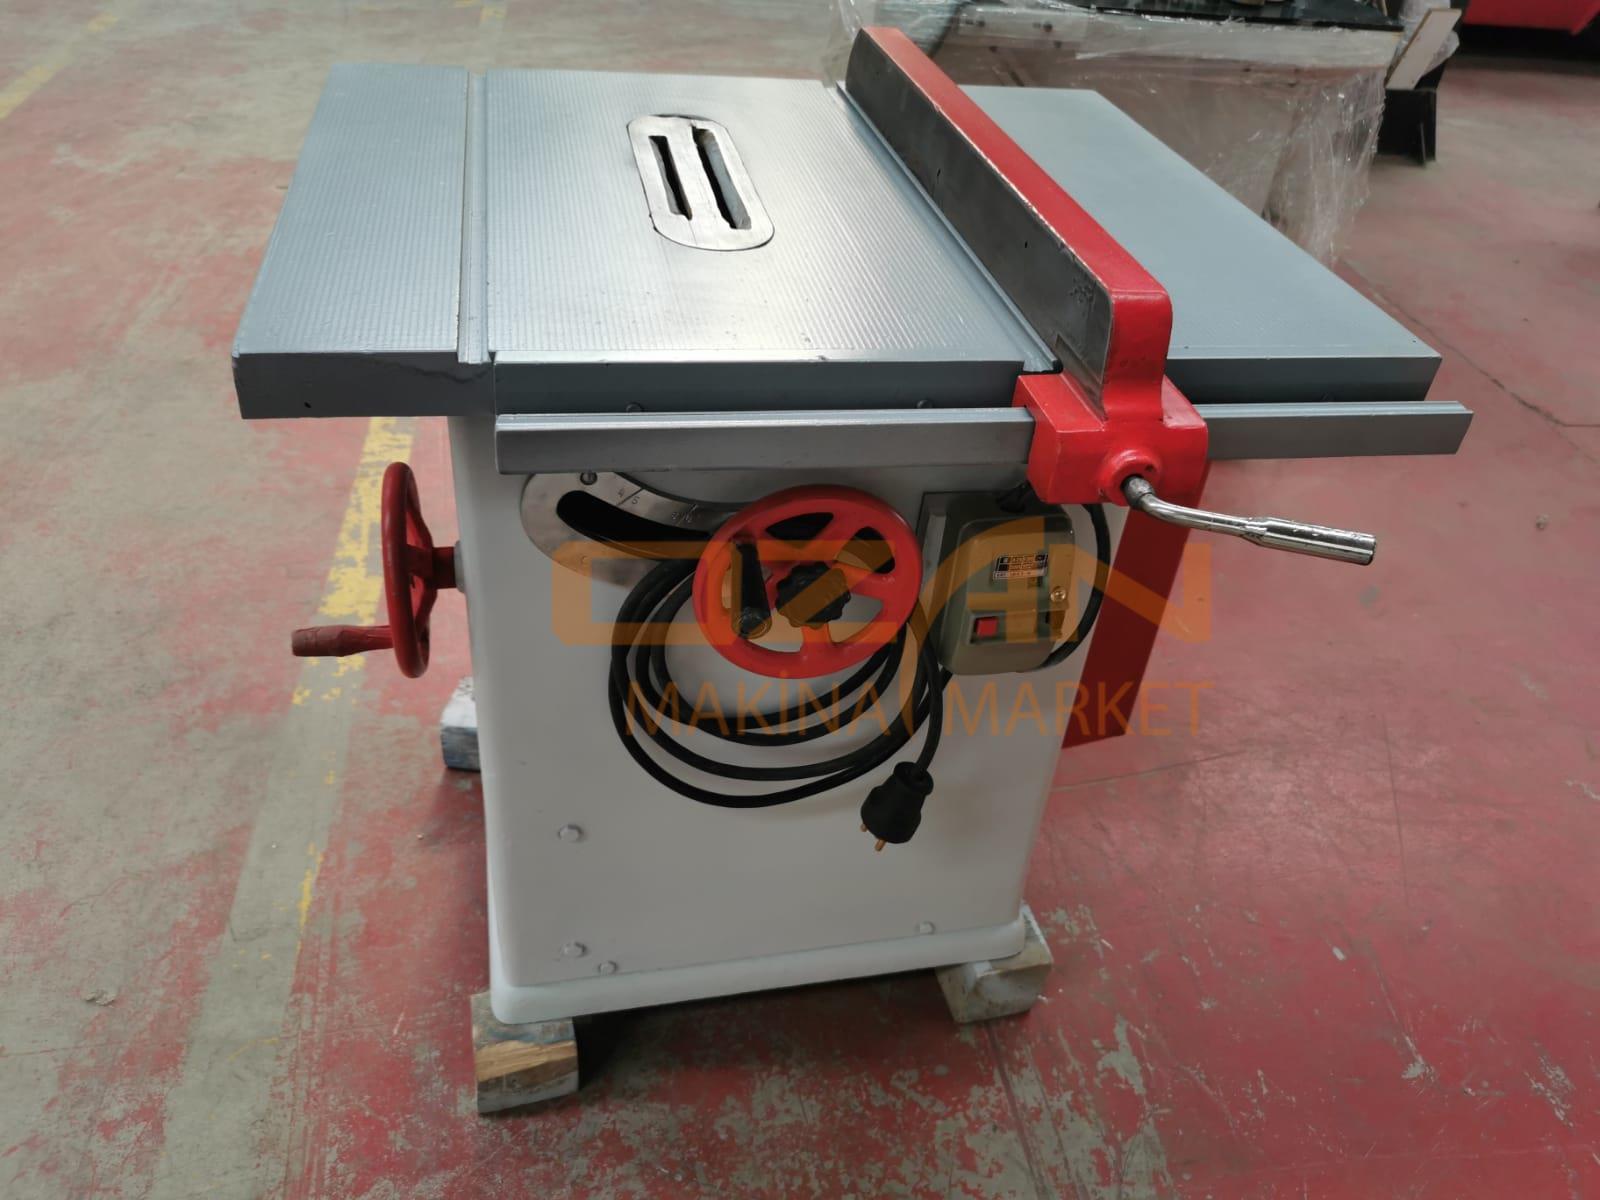 KONYALILAR TABLESS CARLESS SINGLE SPEED YACHT CIRCUIT MACHINE